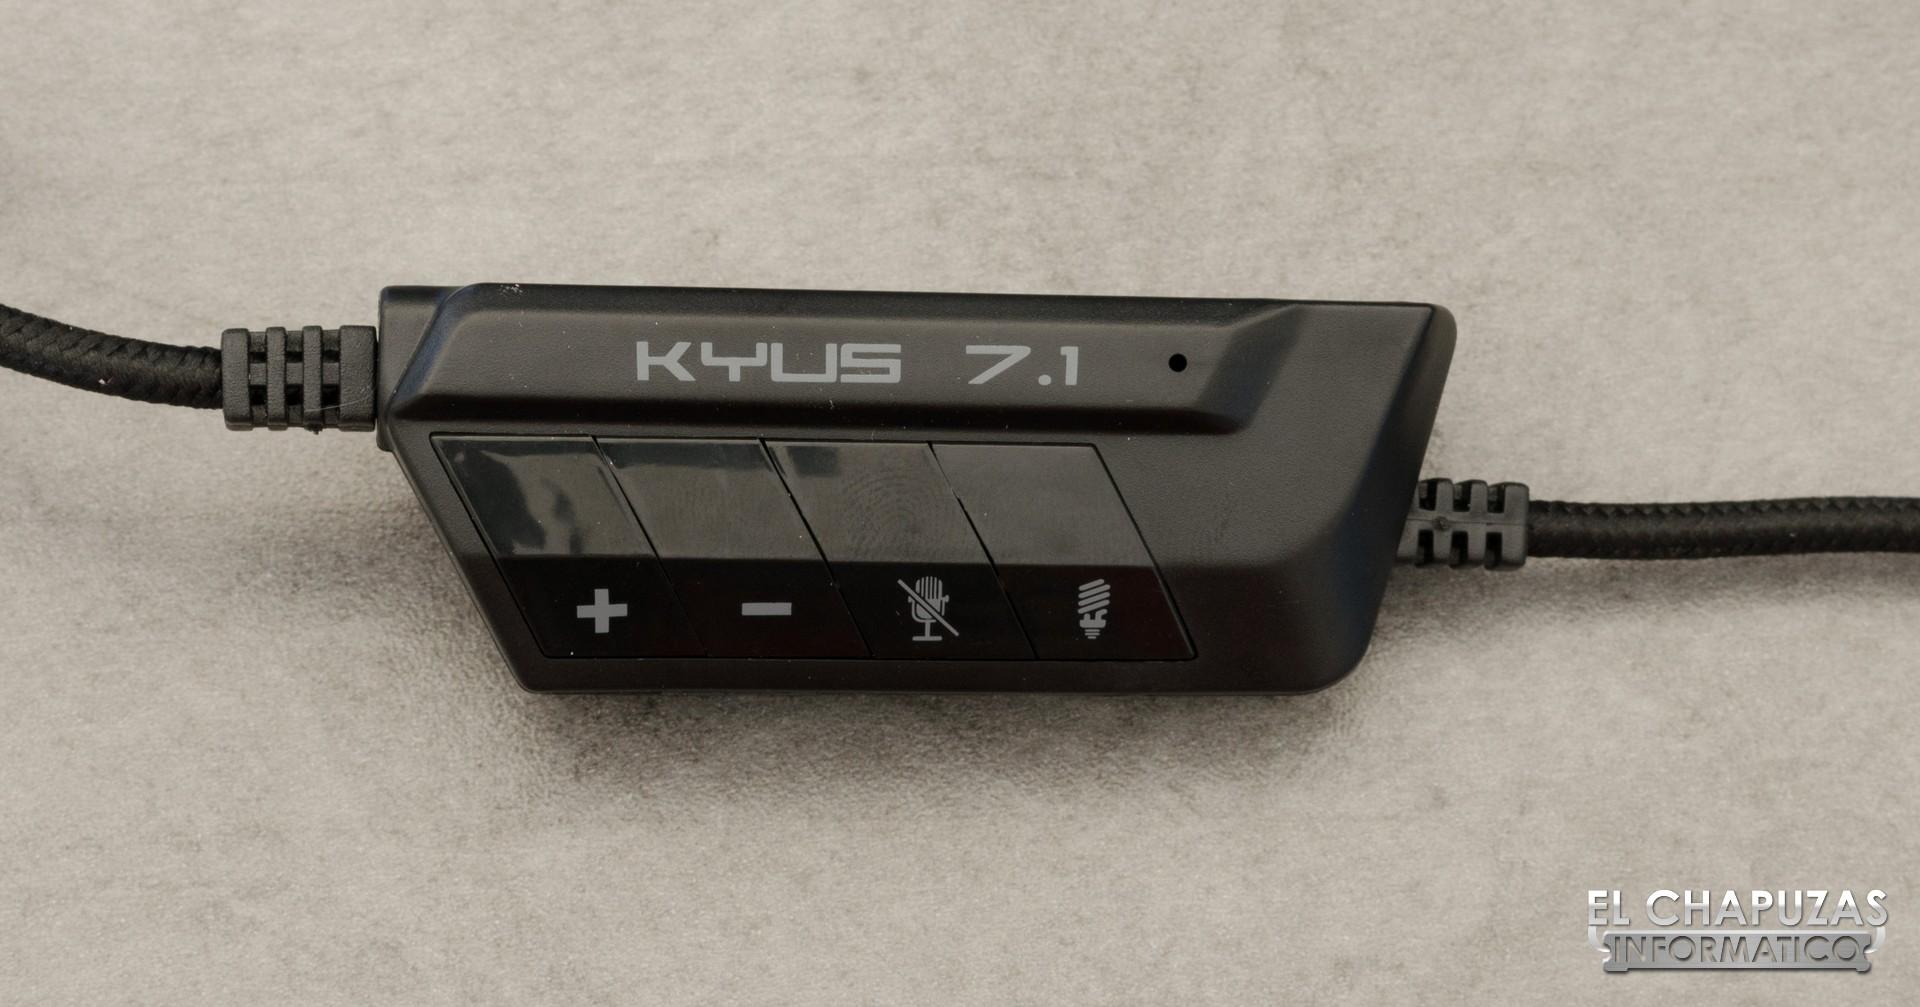 Krom Kyus Review